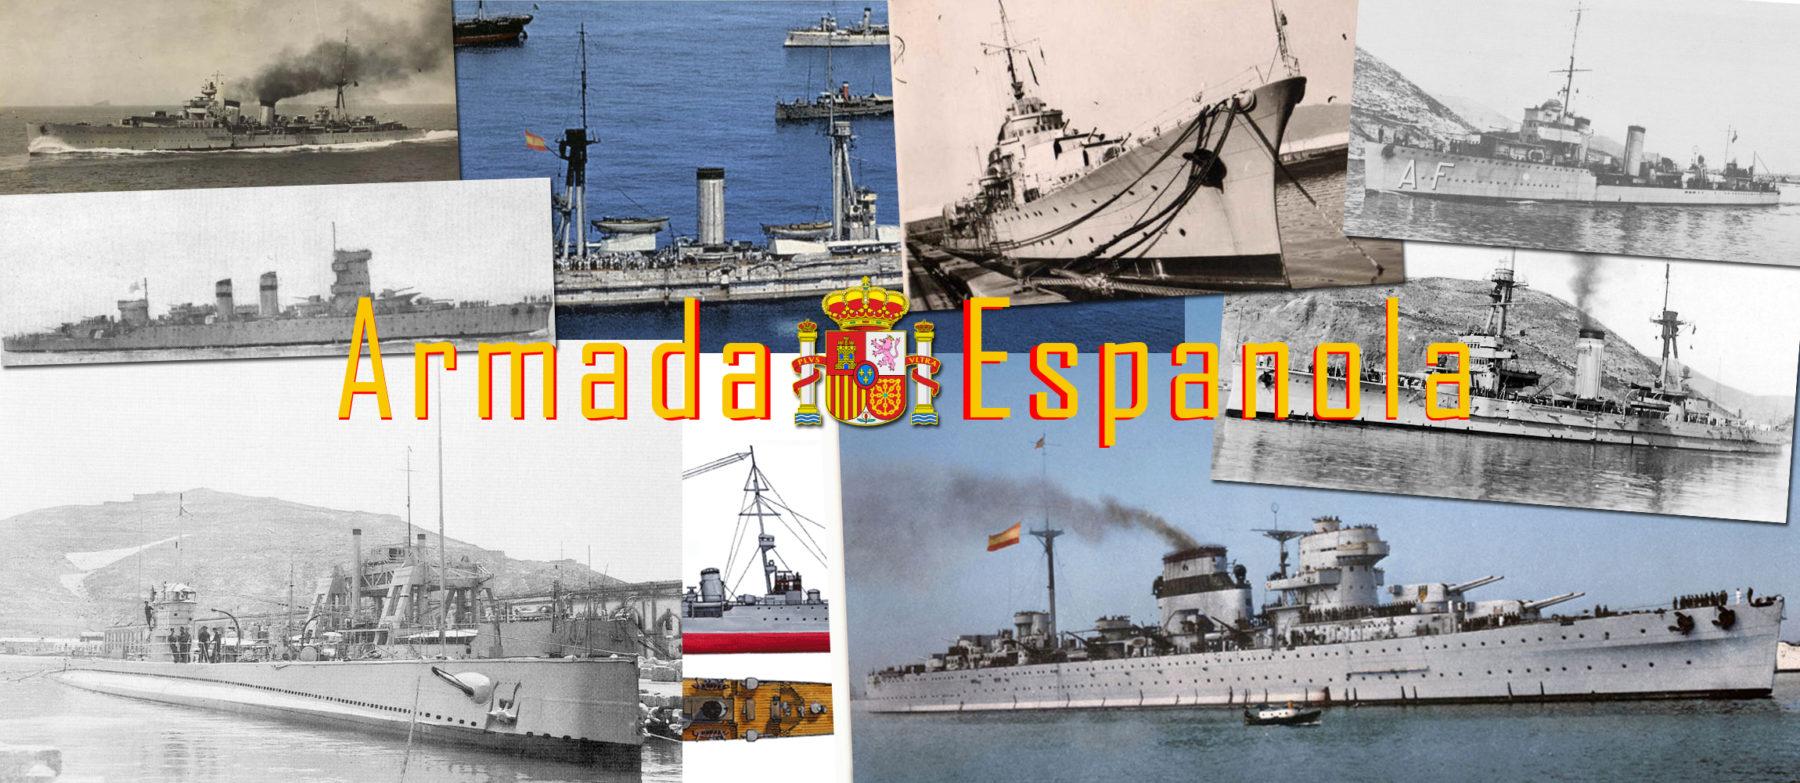 [New Page] Spanish Armada in the interwar & WW2